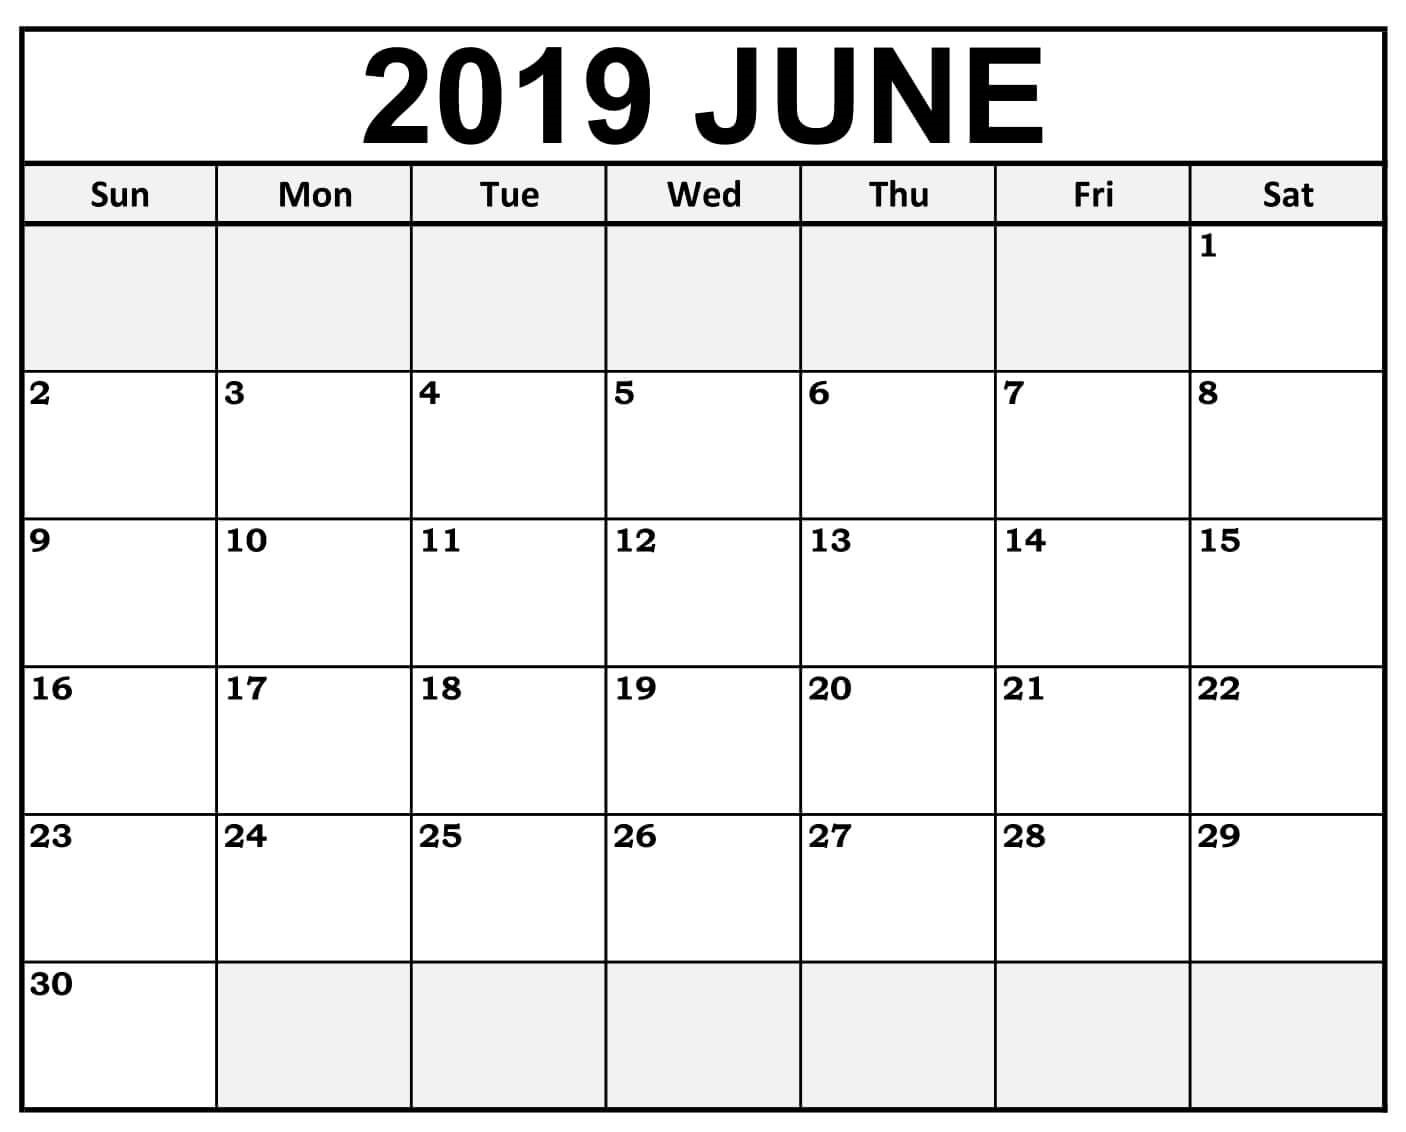 Calendar June 2019